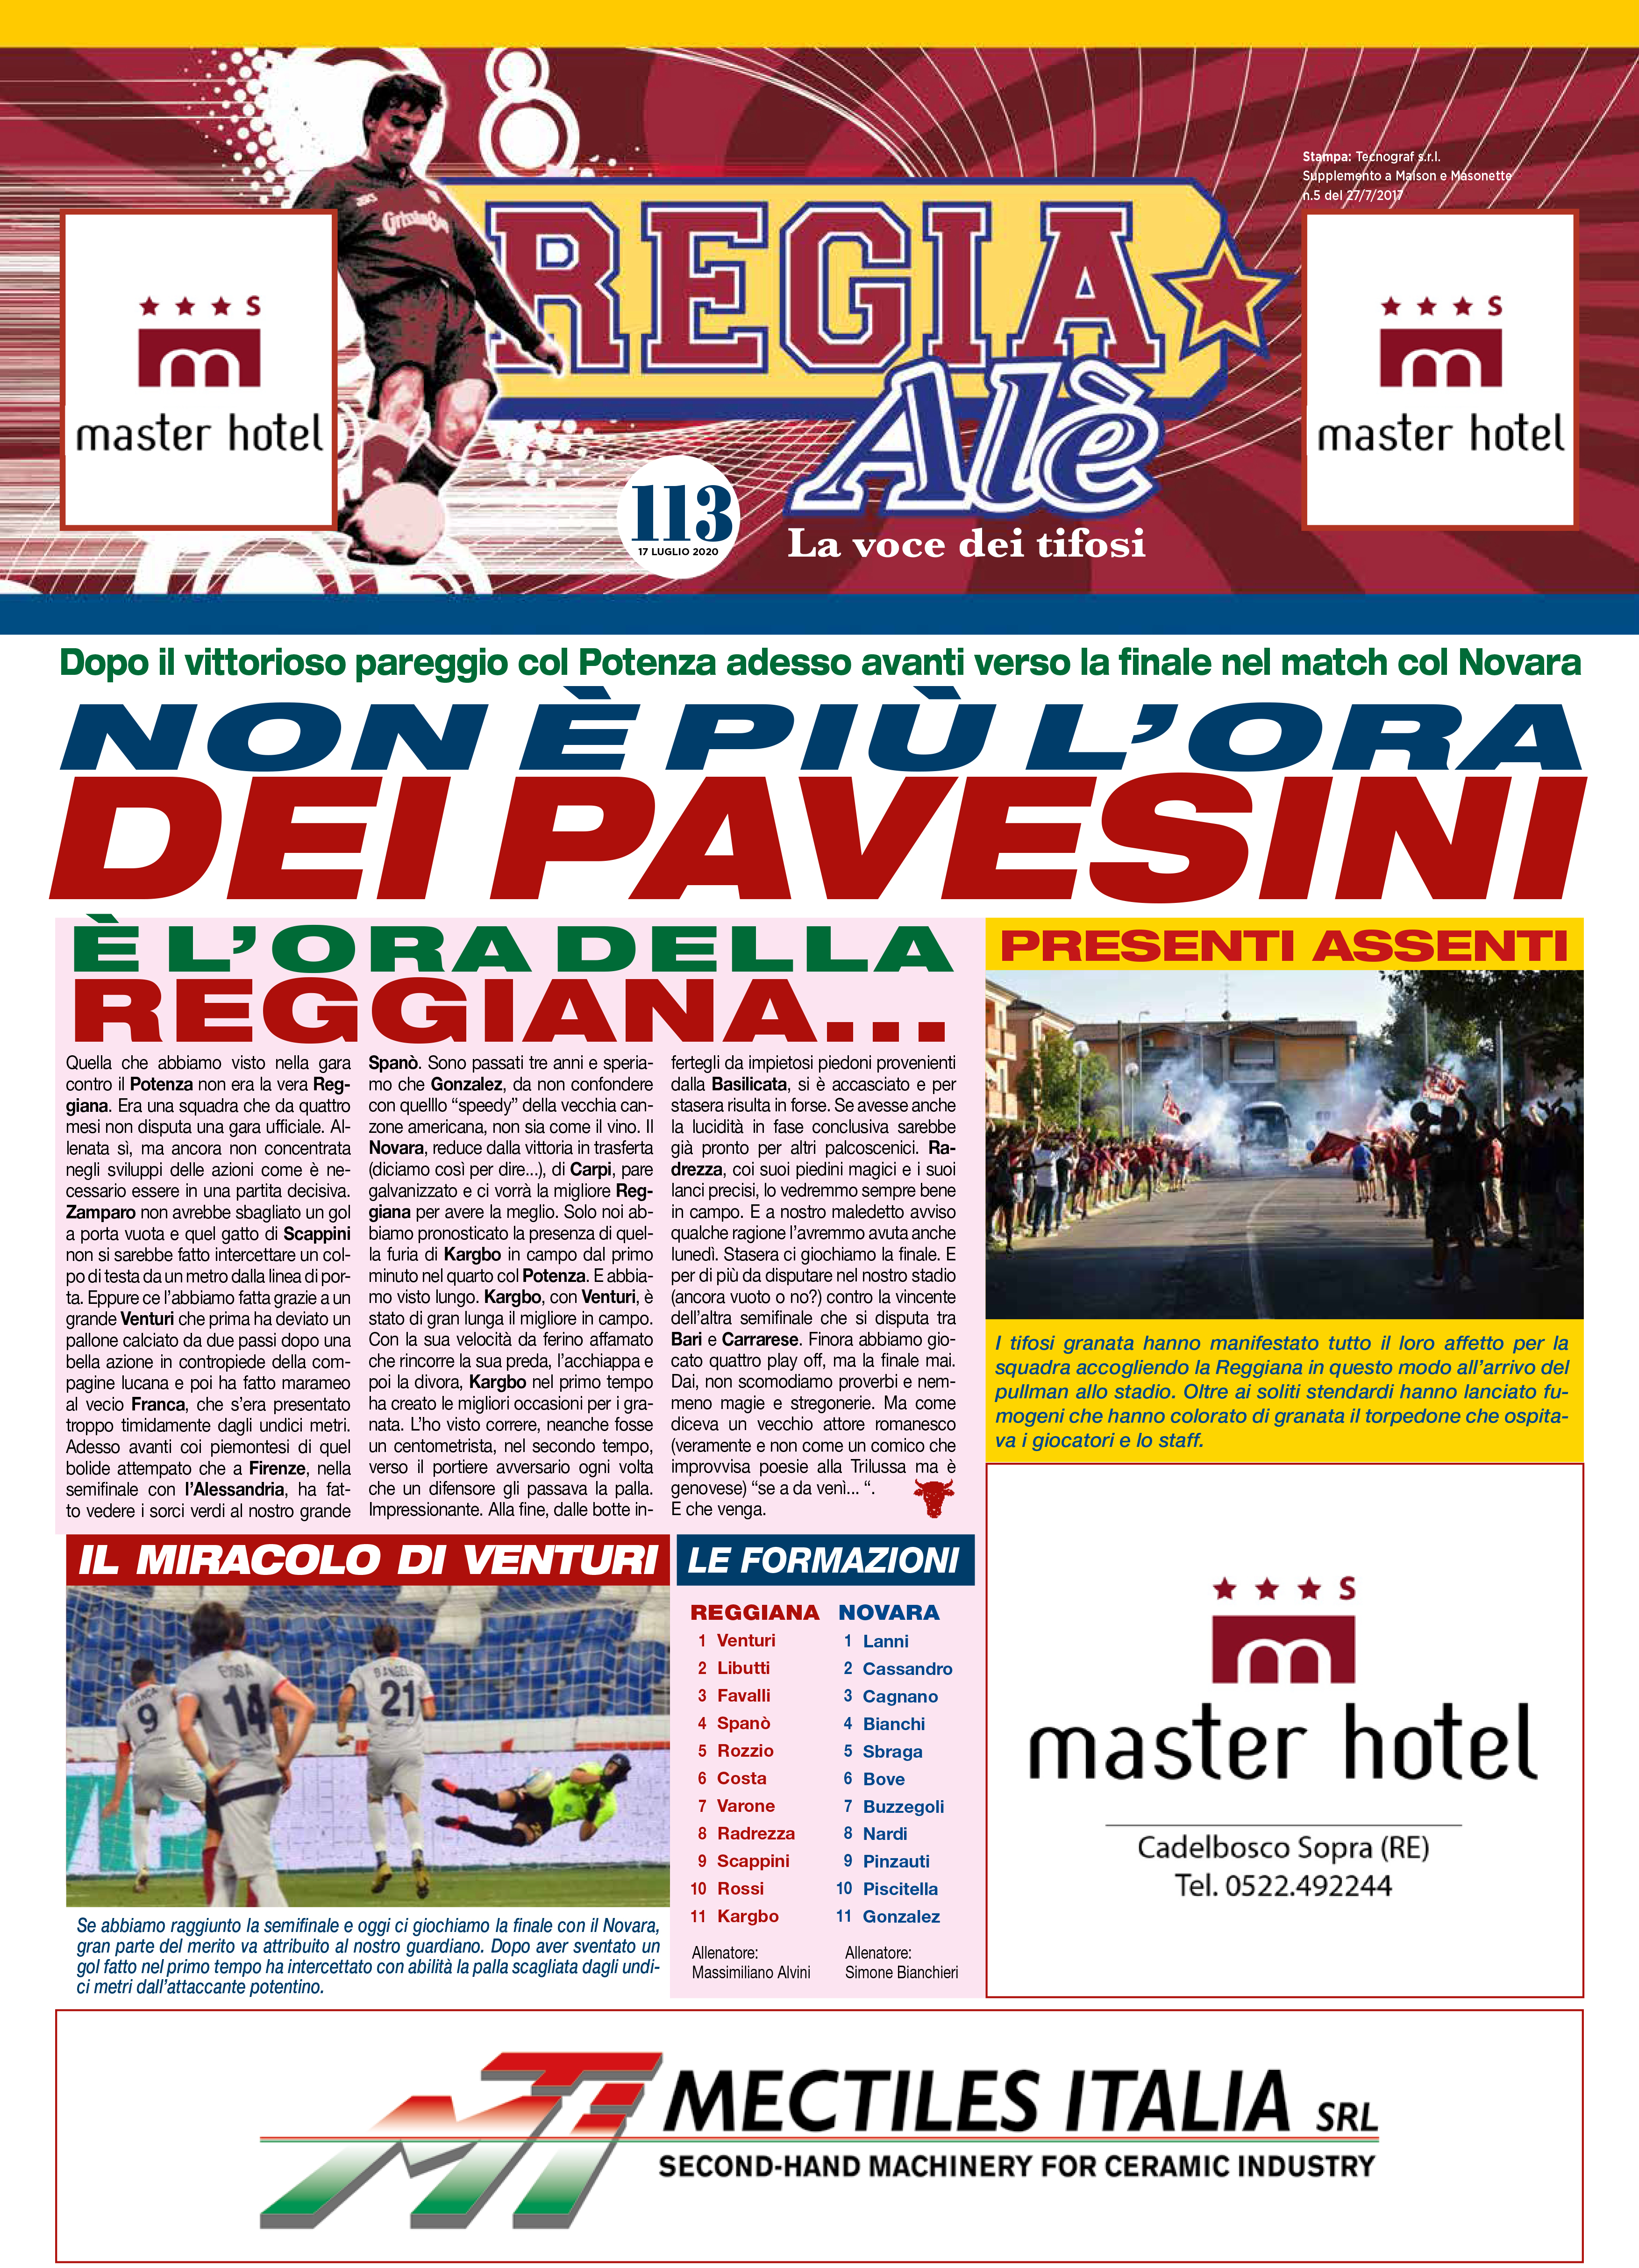 Il numero 113 di Regia Alè in vista di Reggiana – Novara